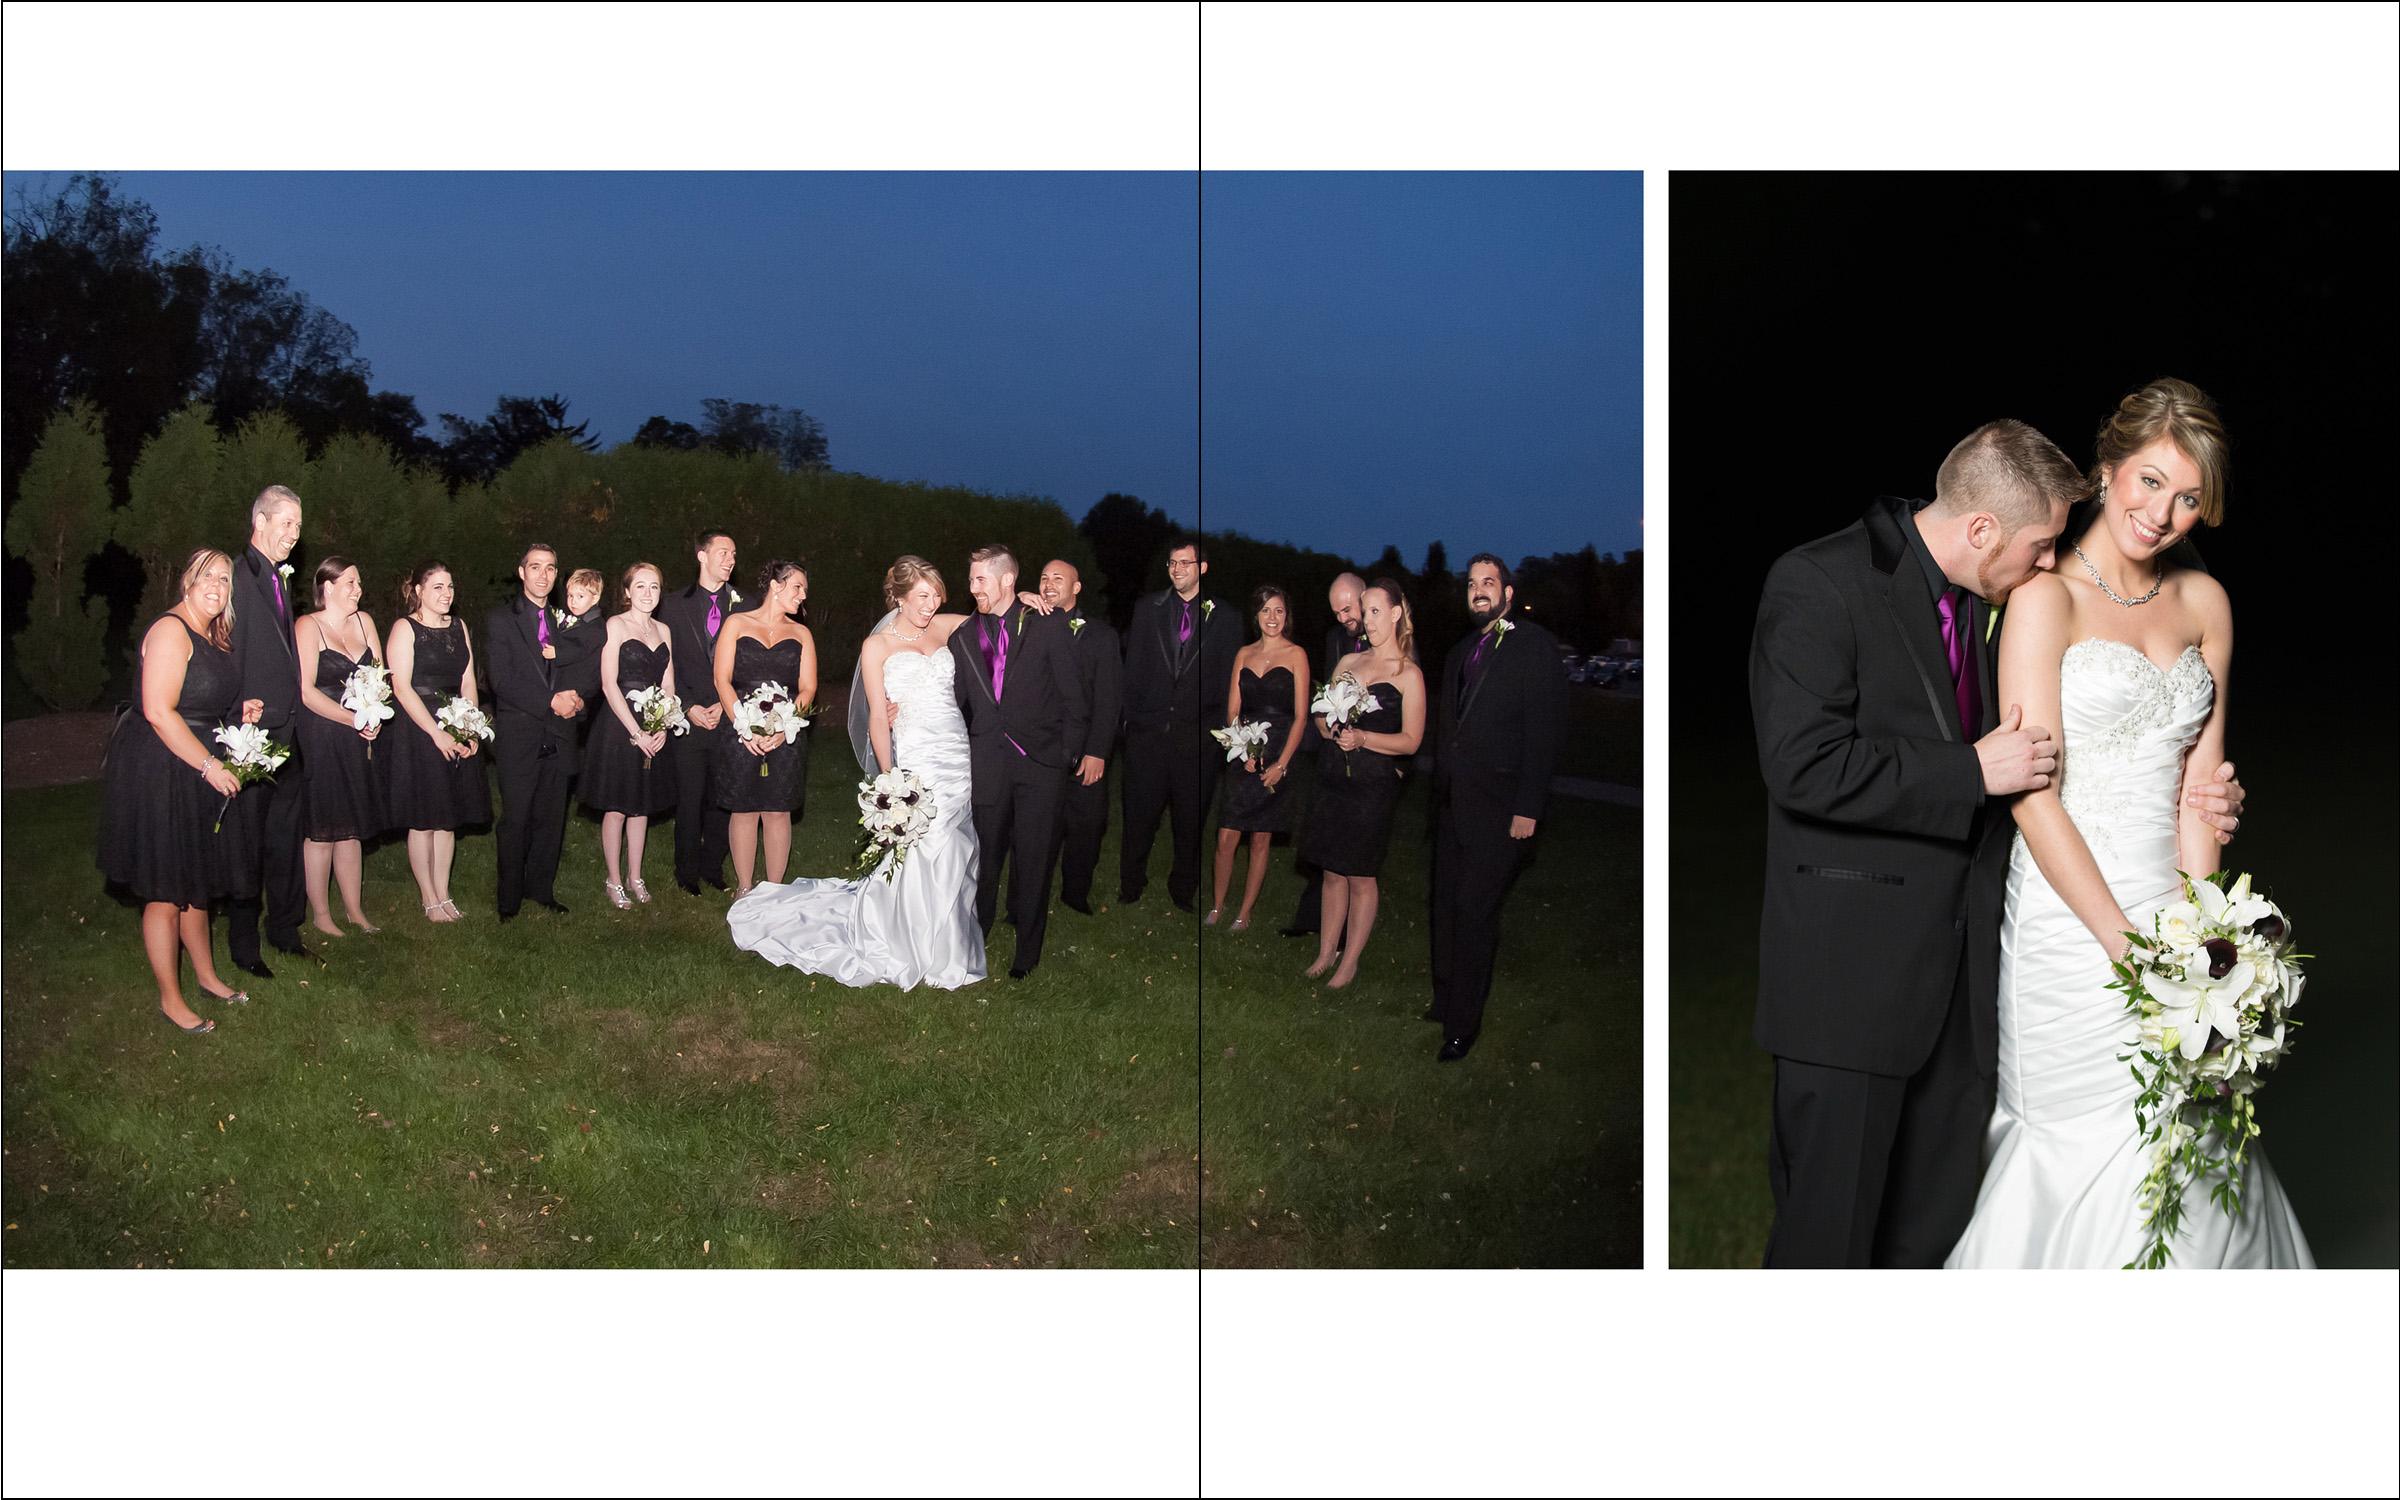 8x10 Wedding Album8.jpg